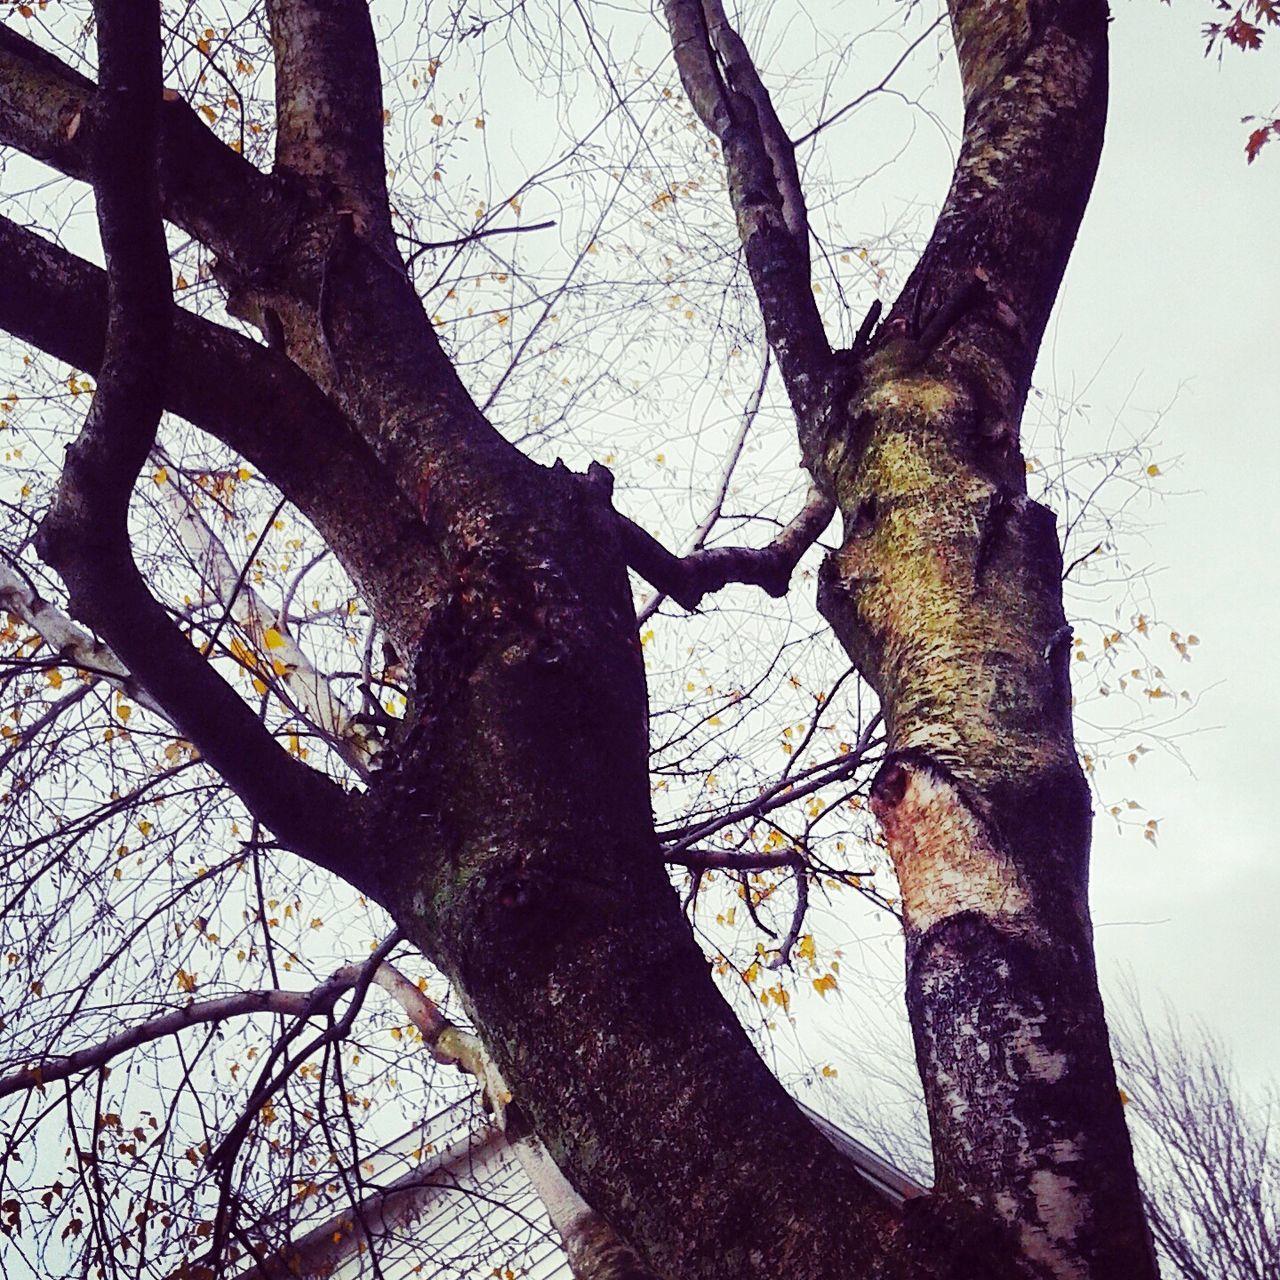 Brich Tree Nature Outdoors EyeEm Automne Autumn Bouleau Granby